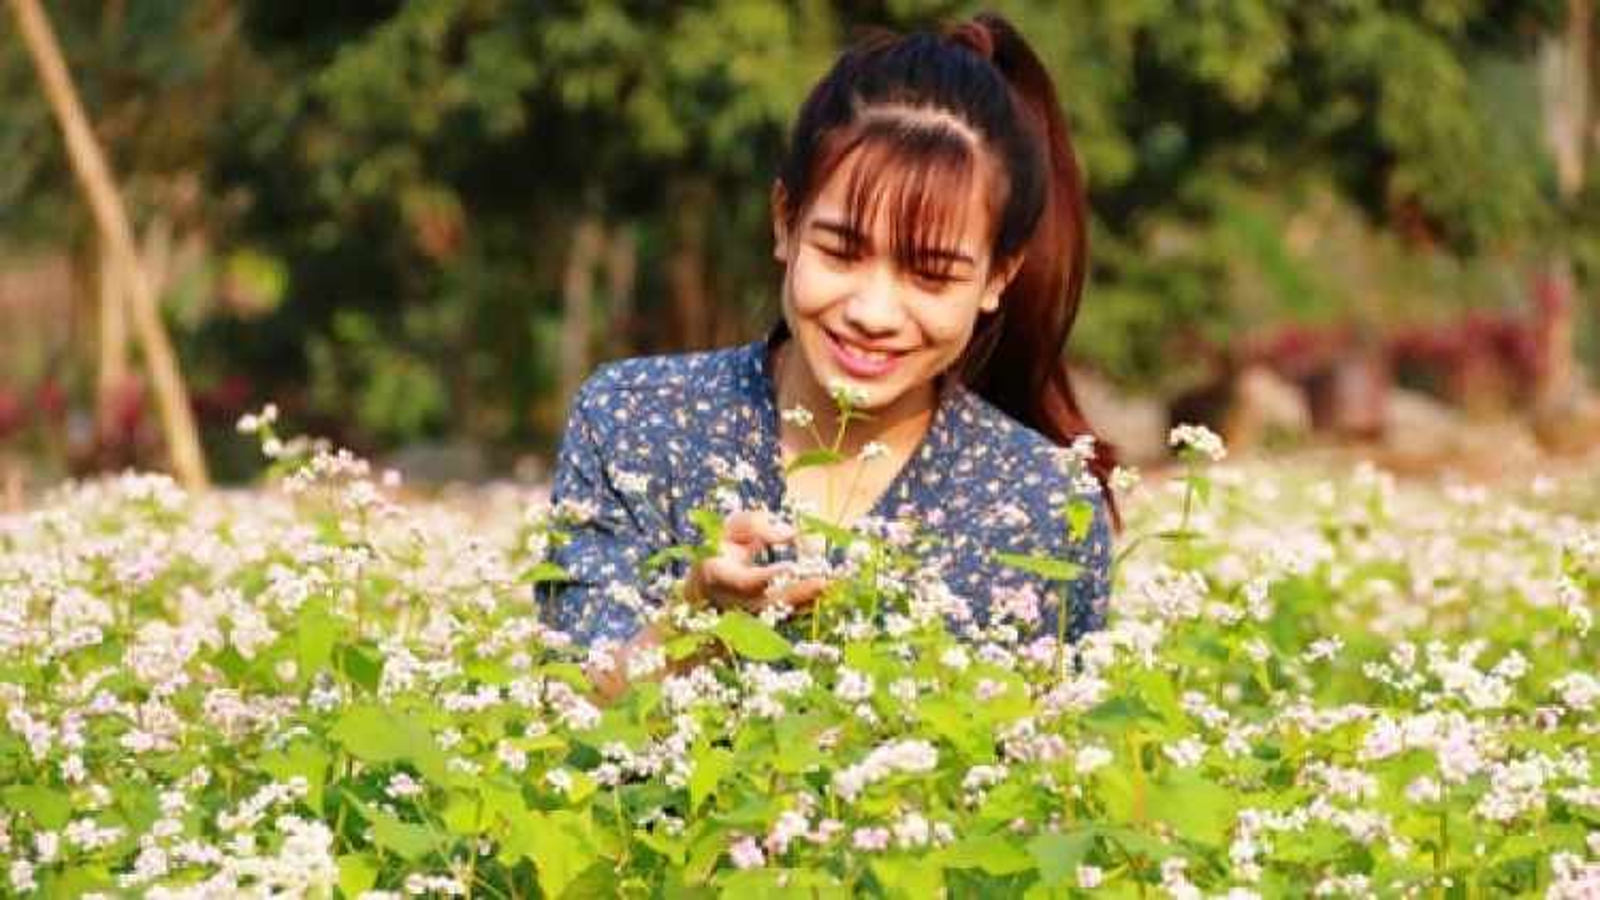 Ninh Binh brightened with Tam Giac Mach flowers blooming